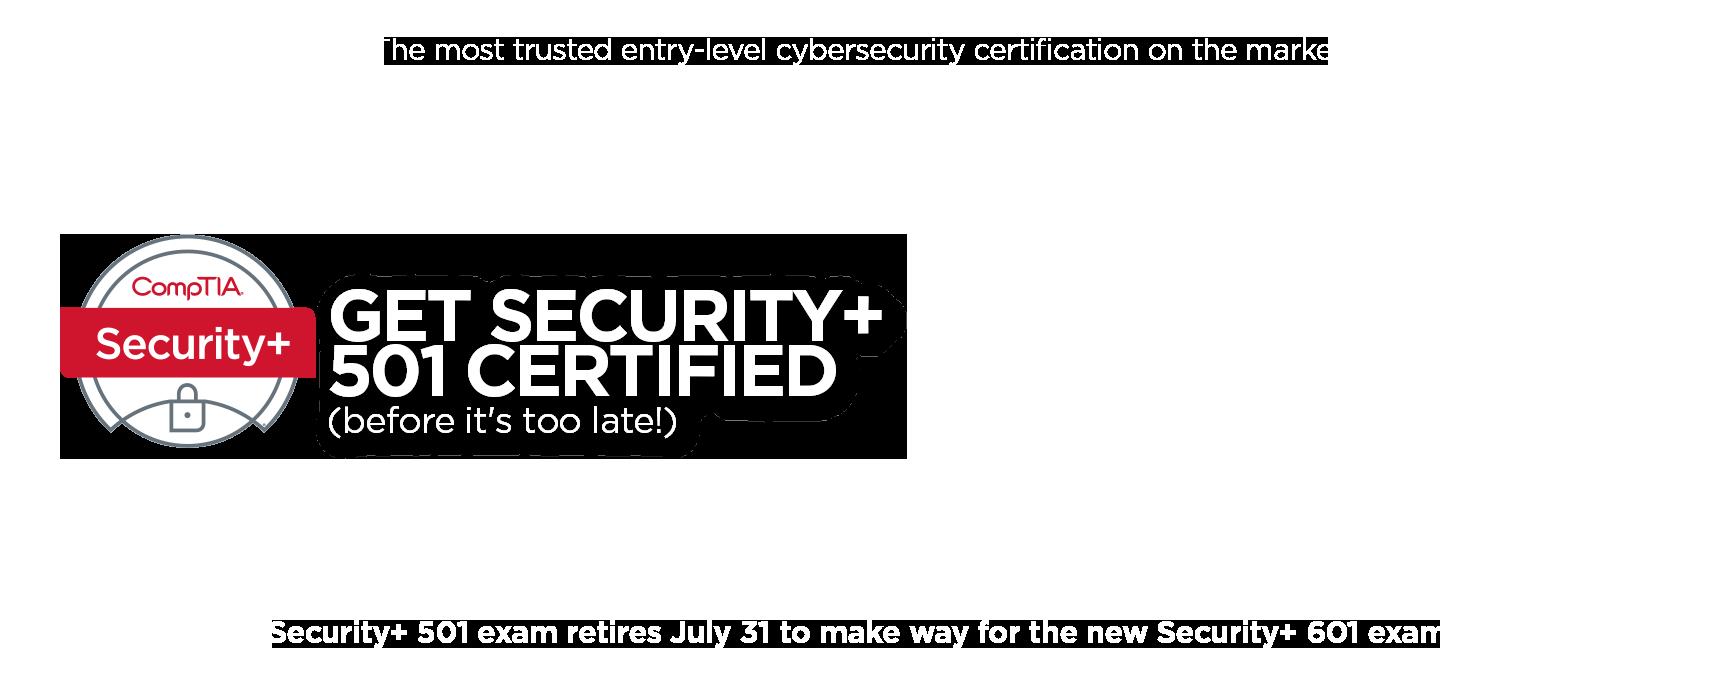 CompTIA security+ retire